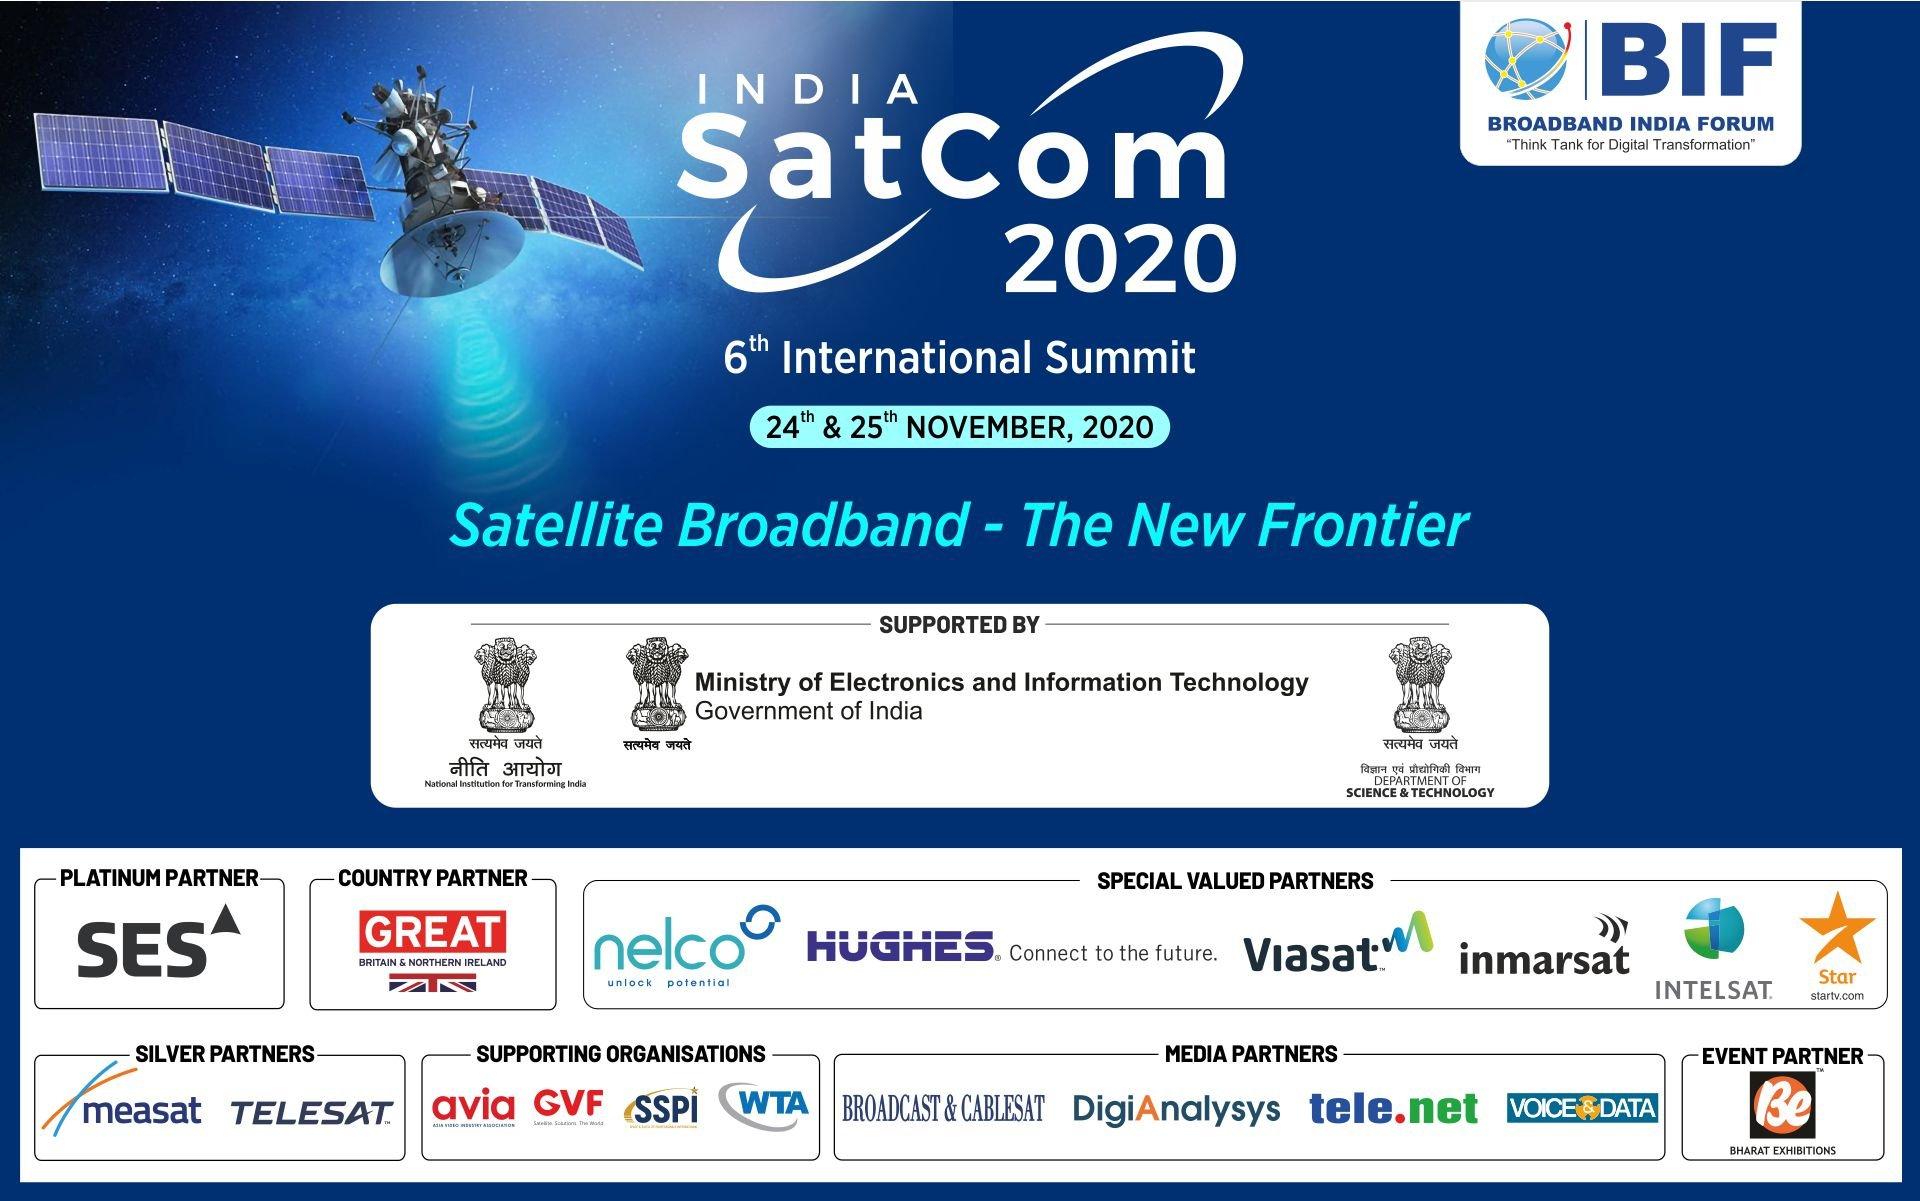 India Satcom 2020